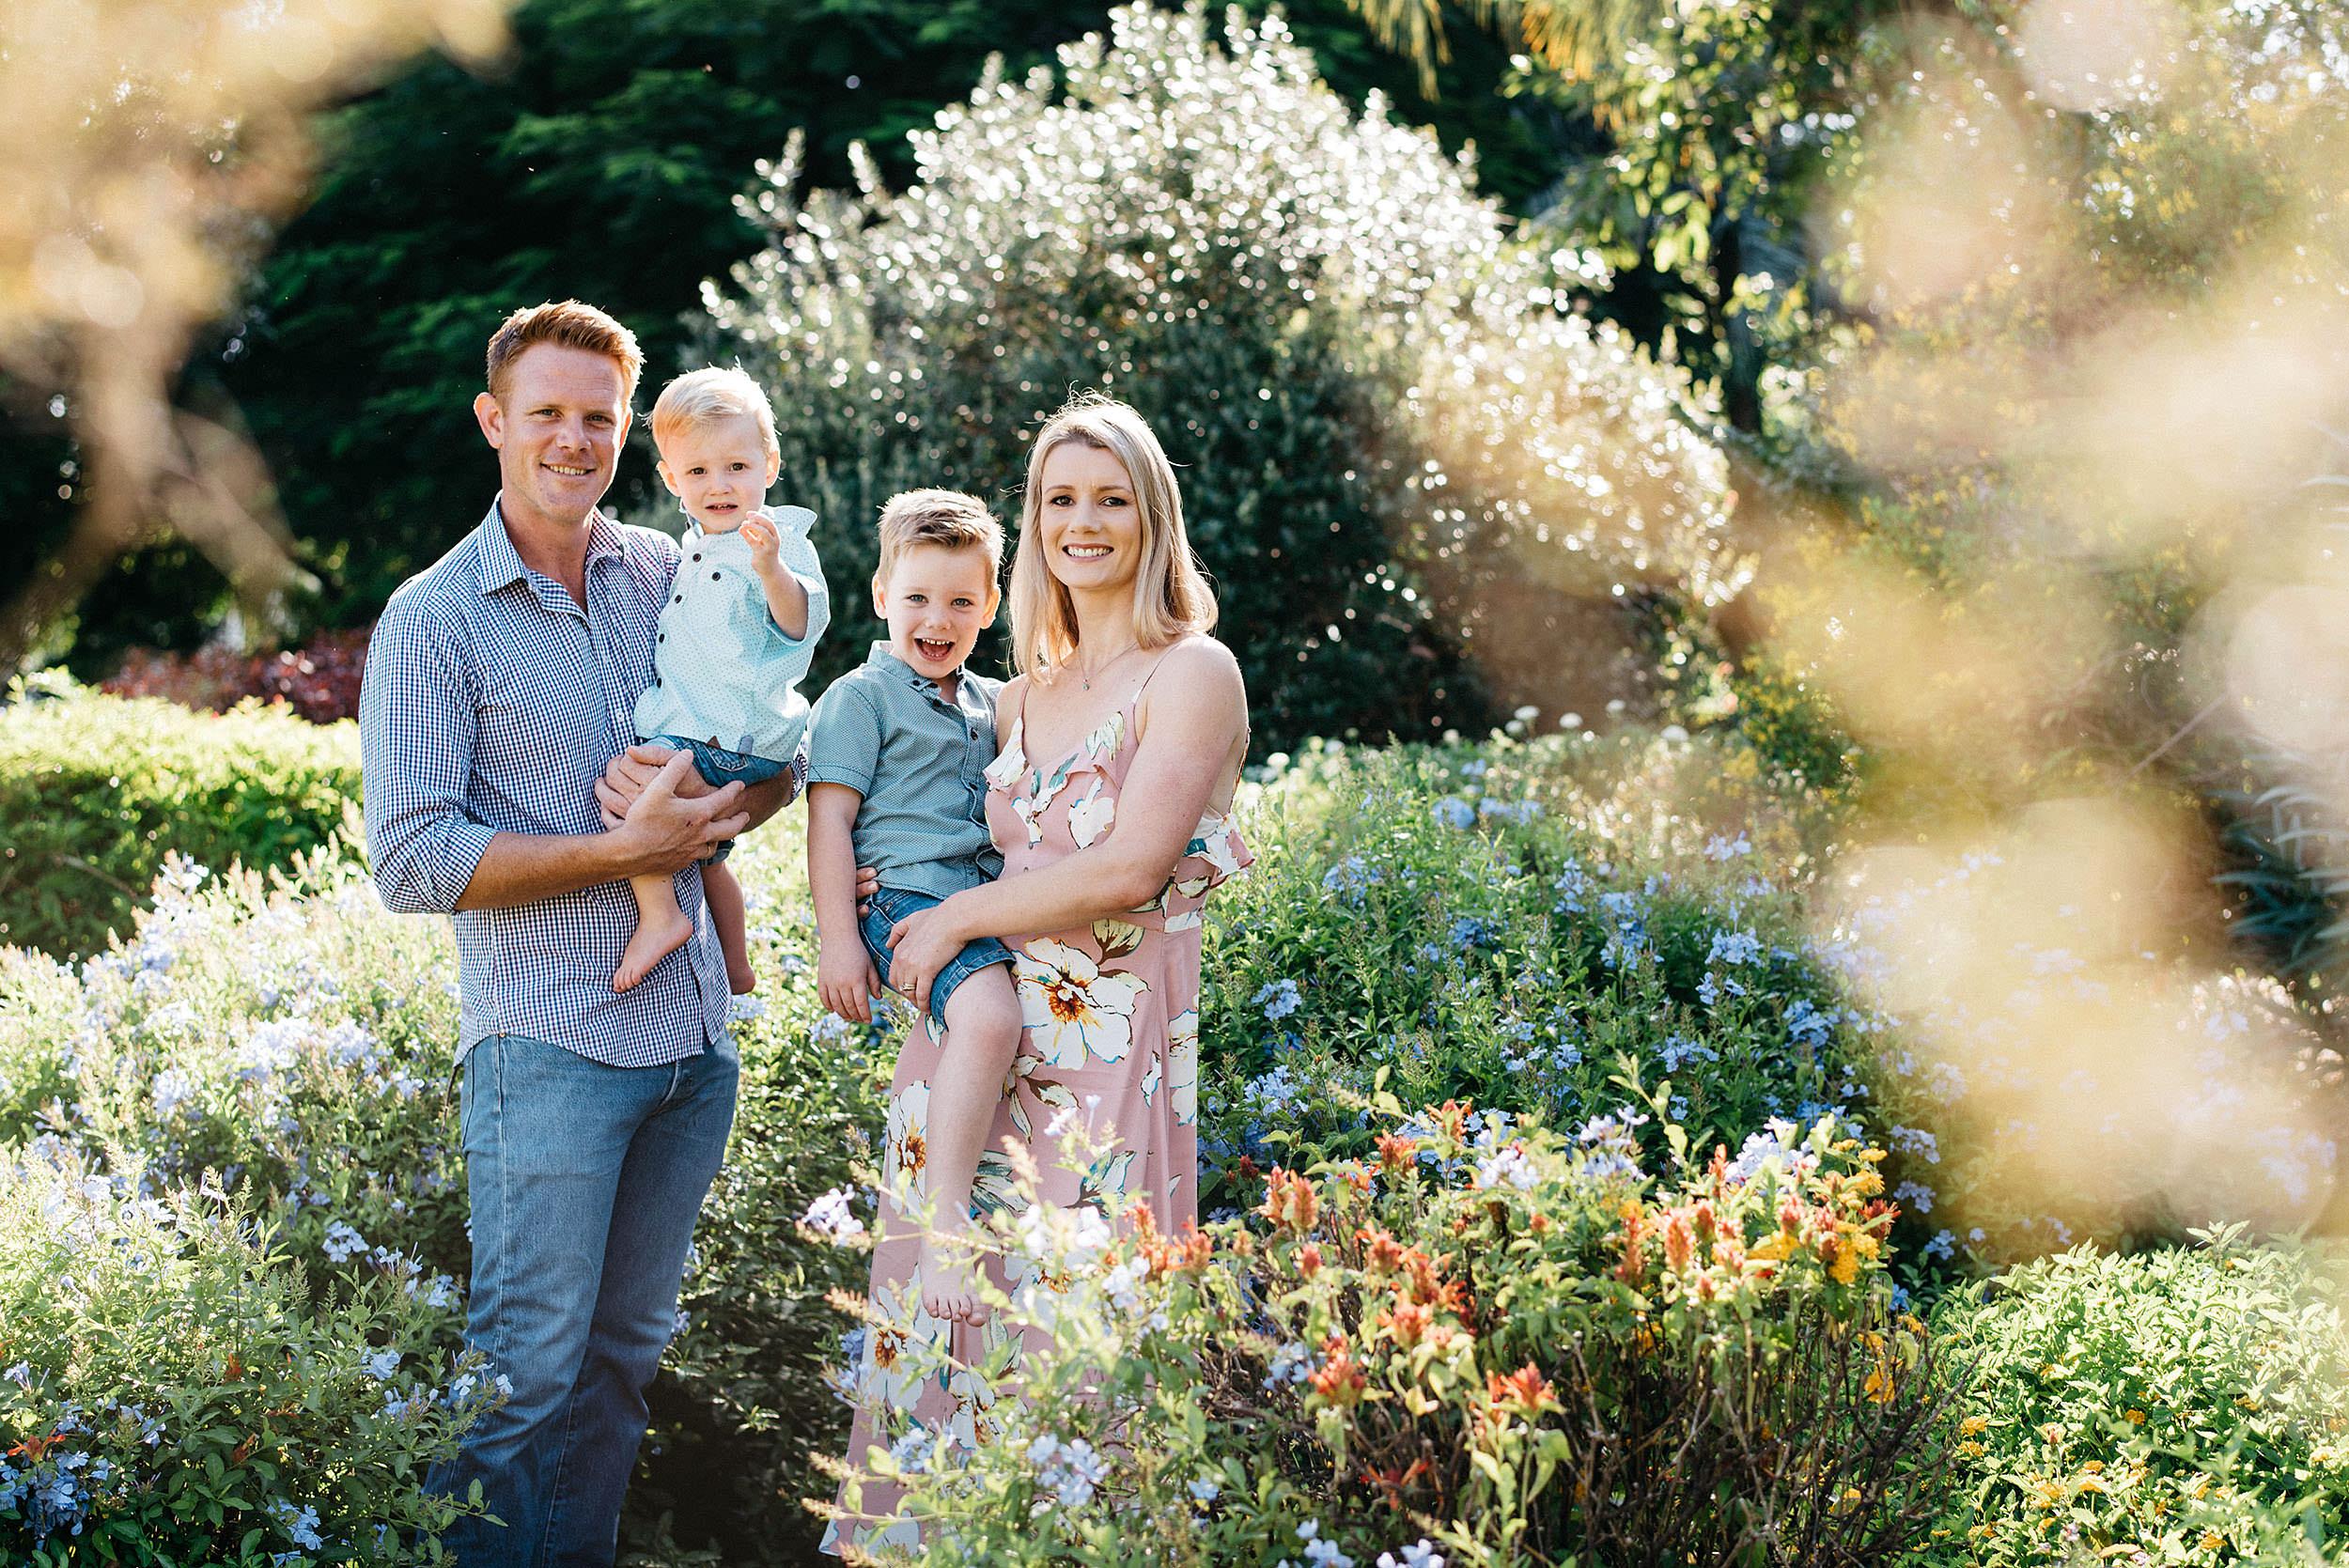 brisbane-family-portrait-photographer-01.jpg